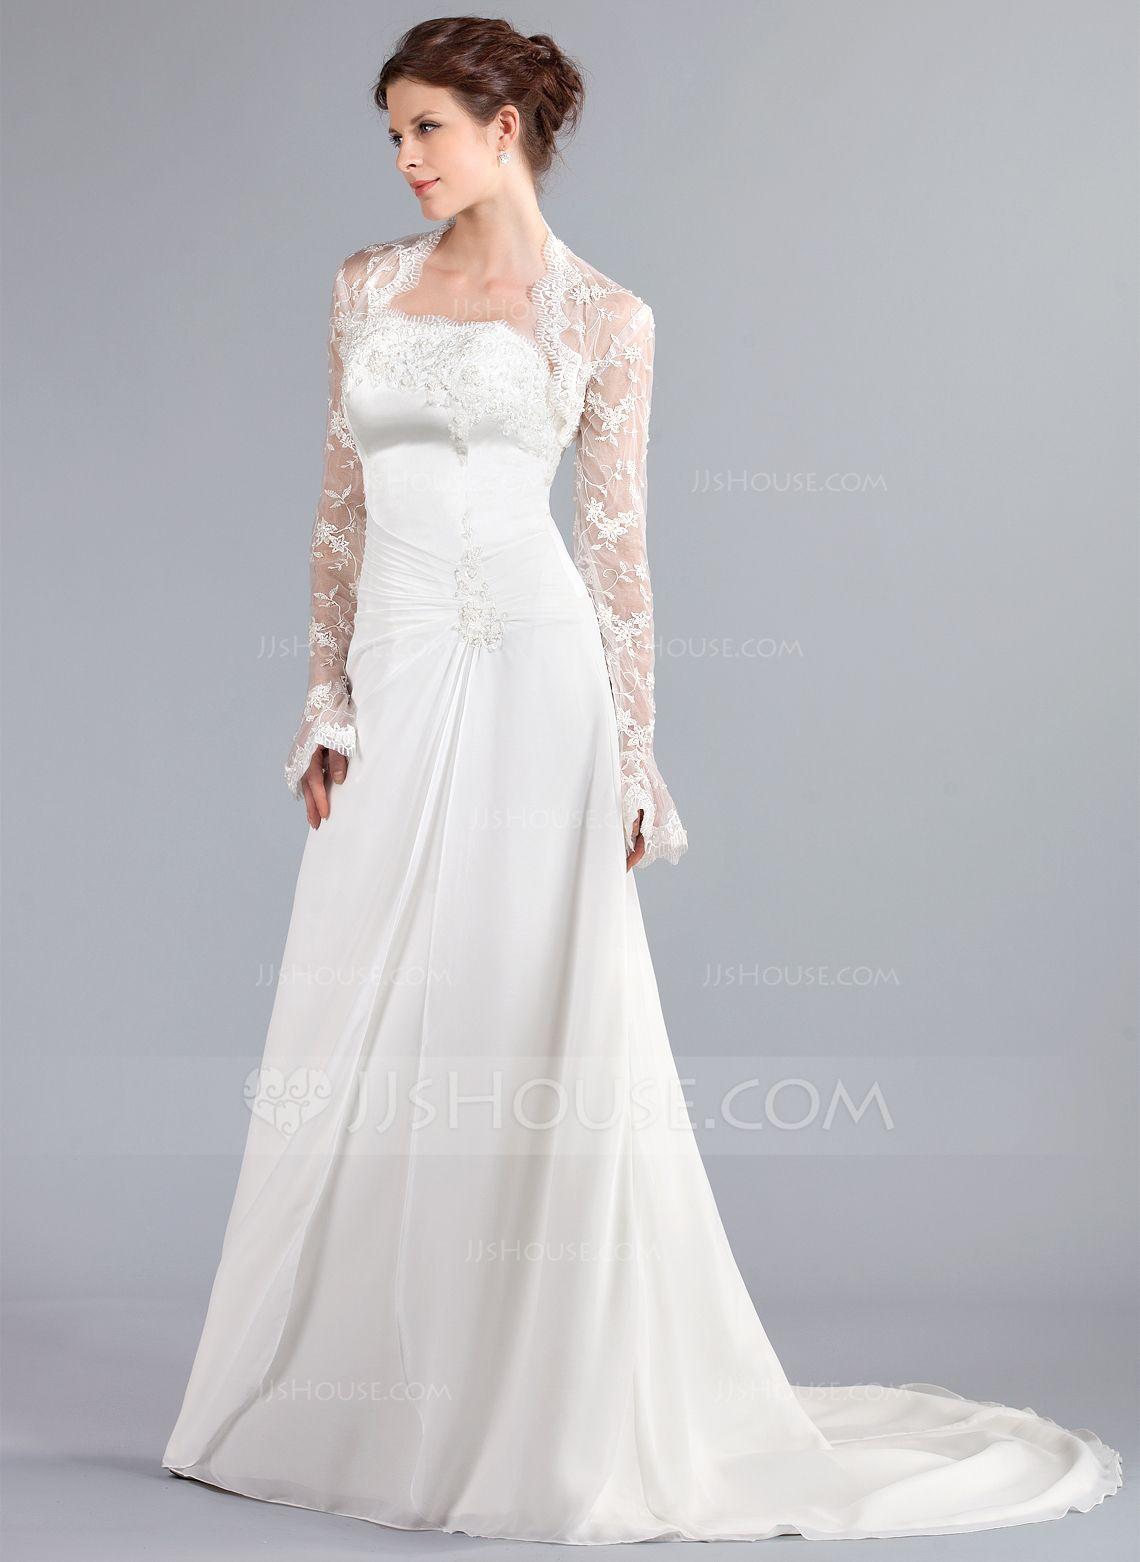 Wrap Wedding Lace Long Sleeve Wraps | Wedding Jackets | Pinterest ...